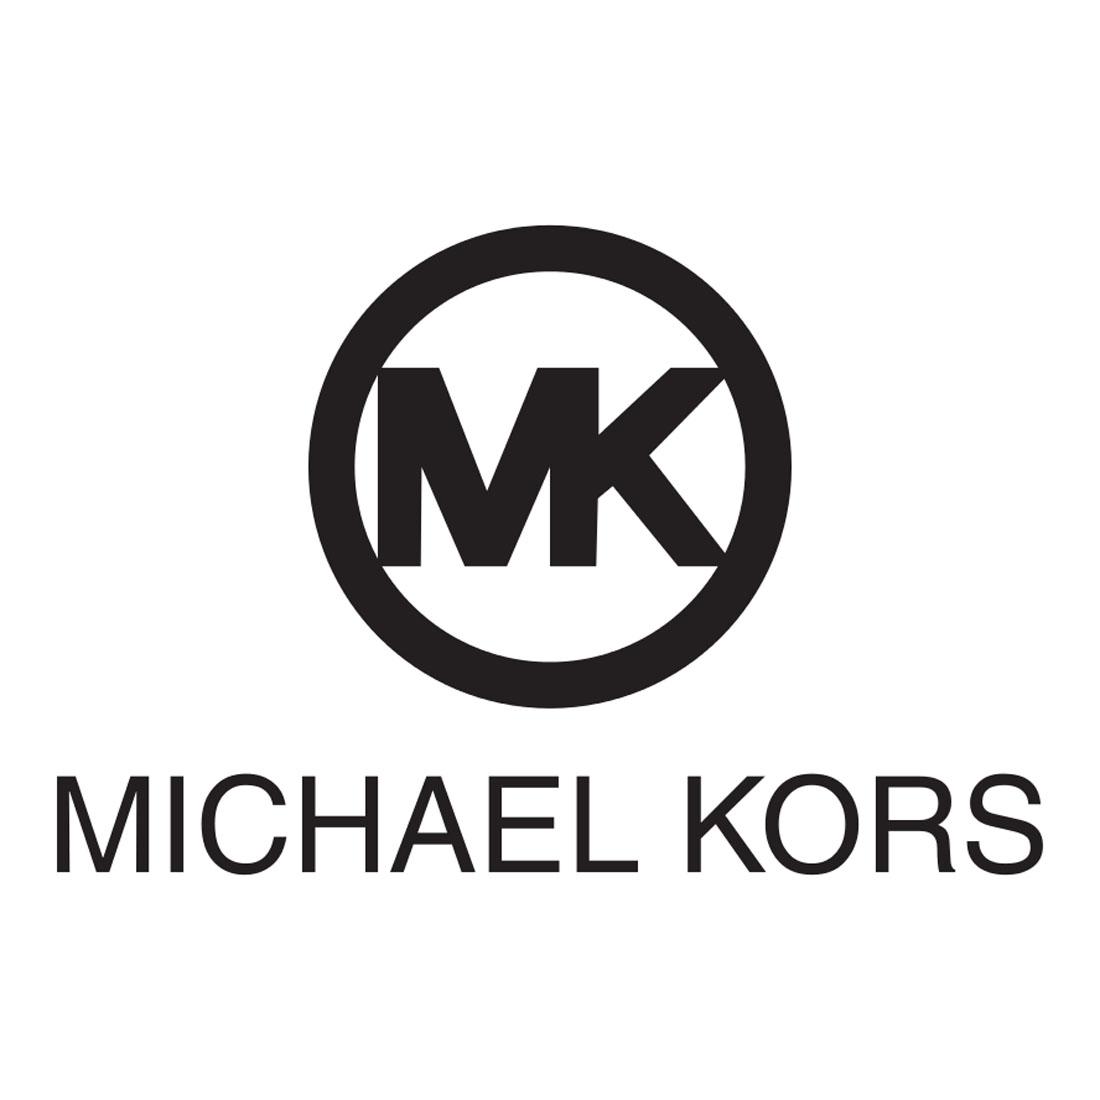 David Kolkka - Capri Holdings - VERSACE | JIMMY CHOO | MICHAEL KORS